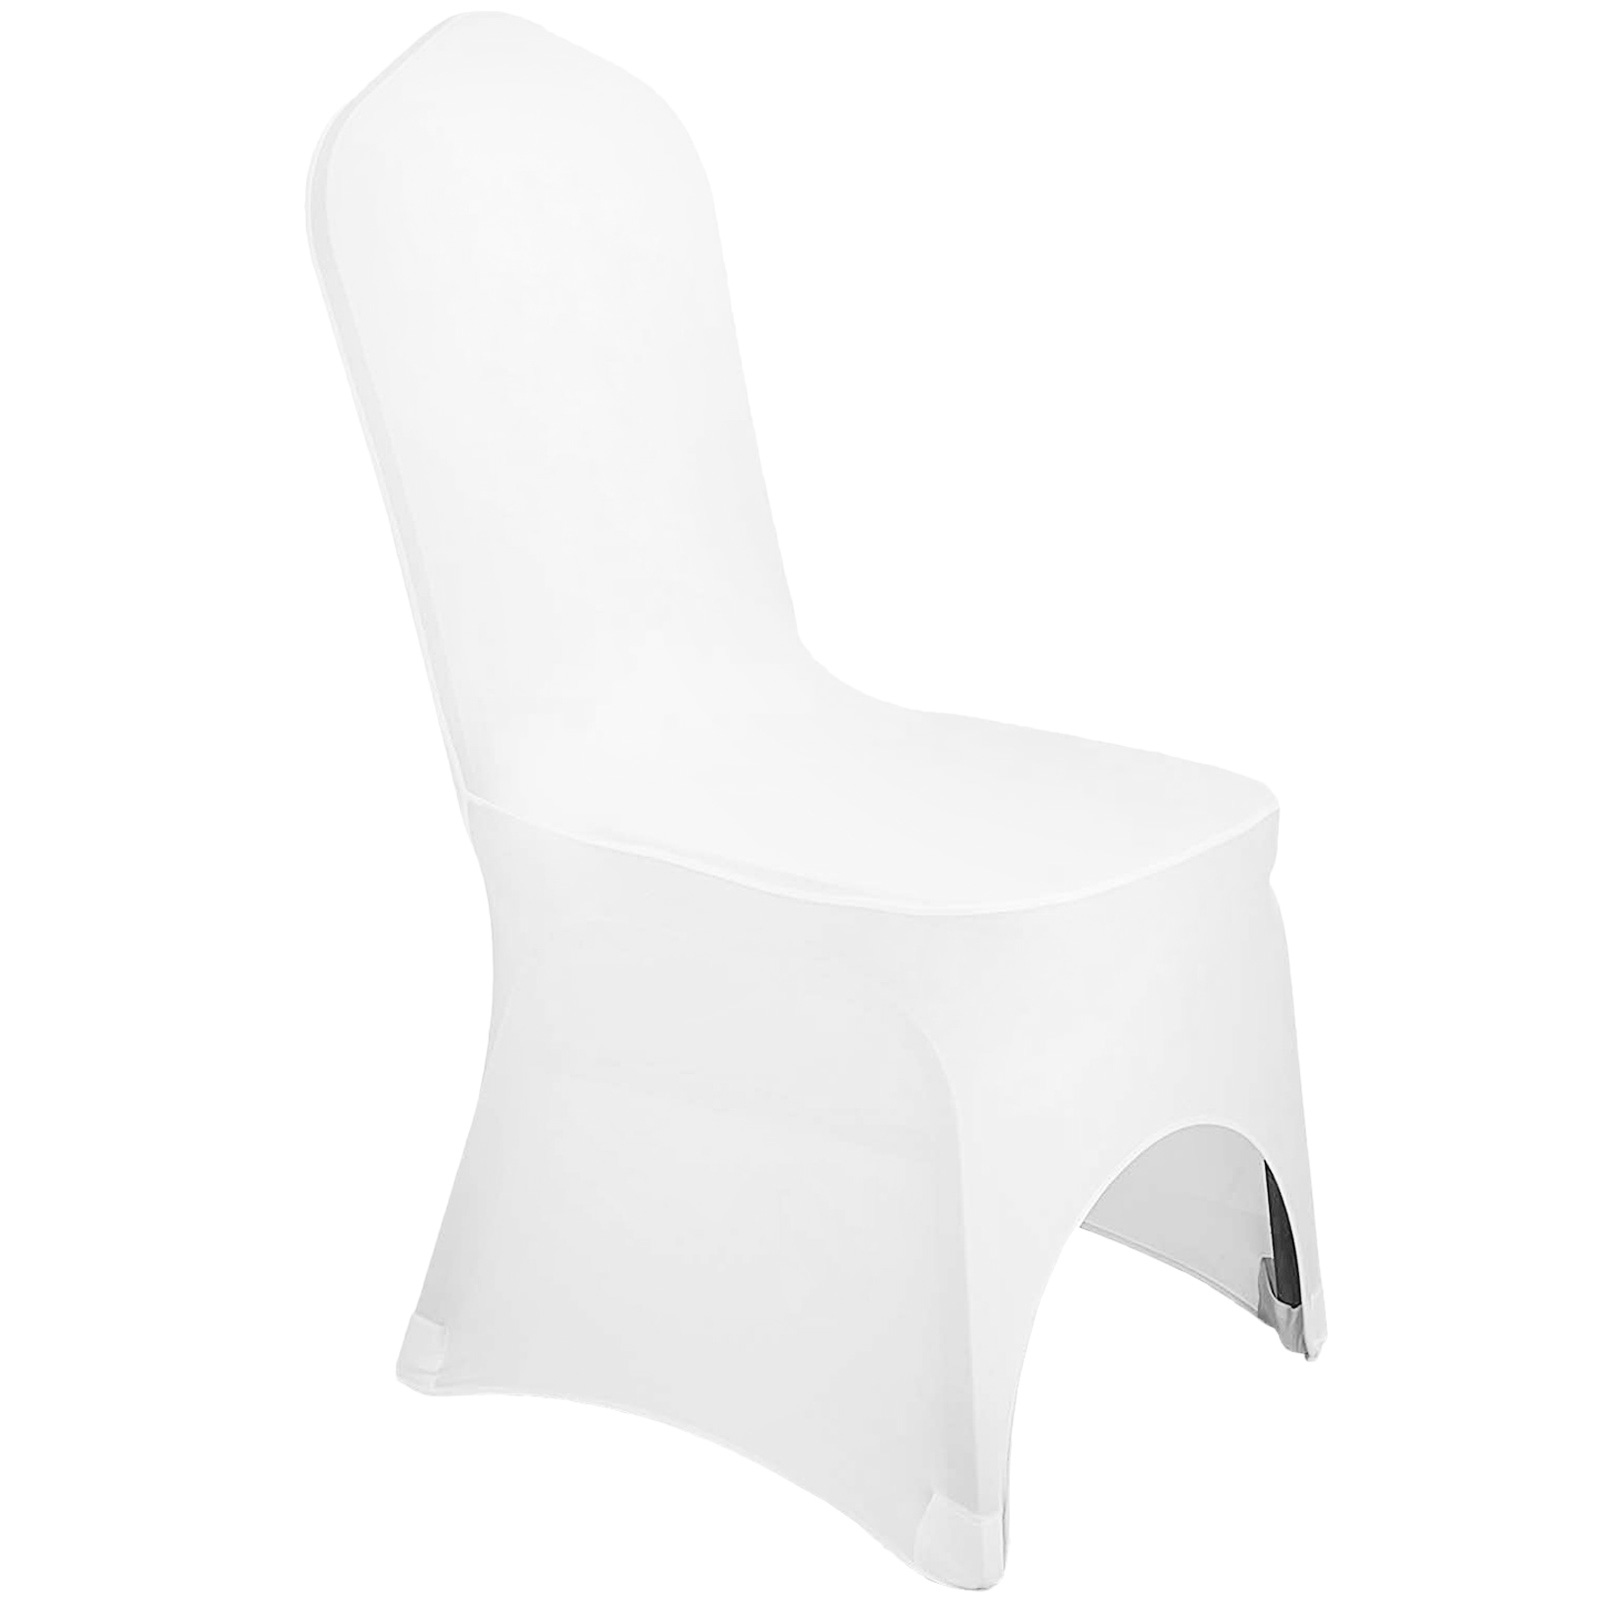 50 100pcs Stretch Spandex Folding Chair Covers Decoration Wedding Celebrations Ebay